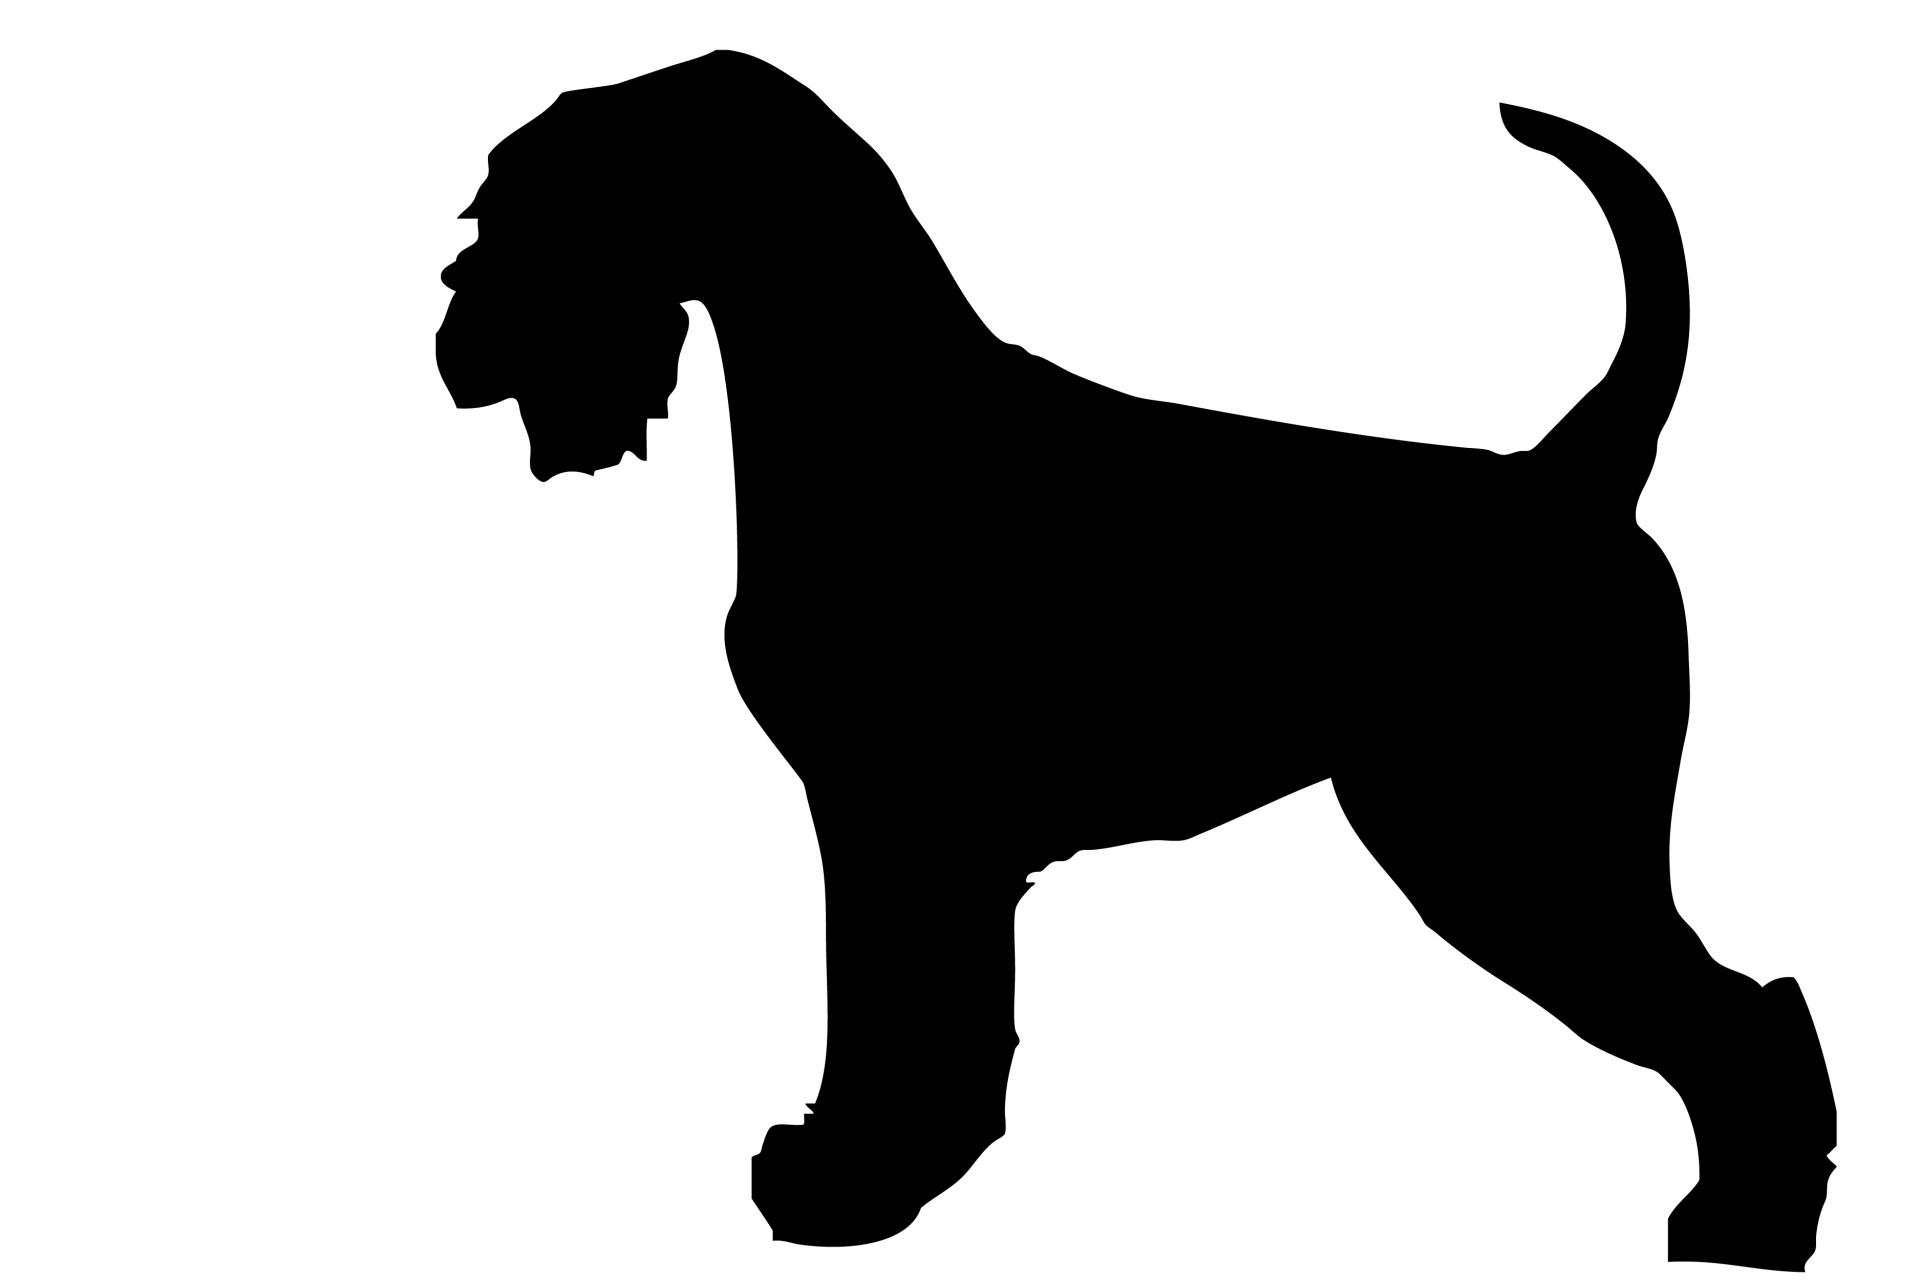 Beagle clipart schnauzer. Silhouette clip art at